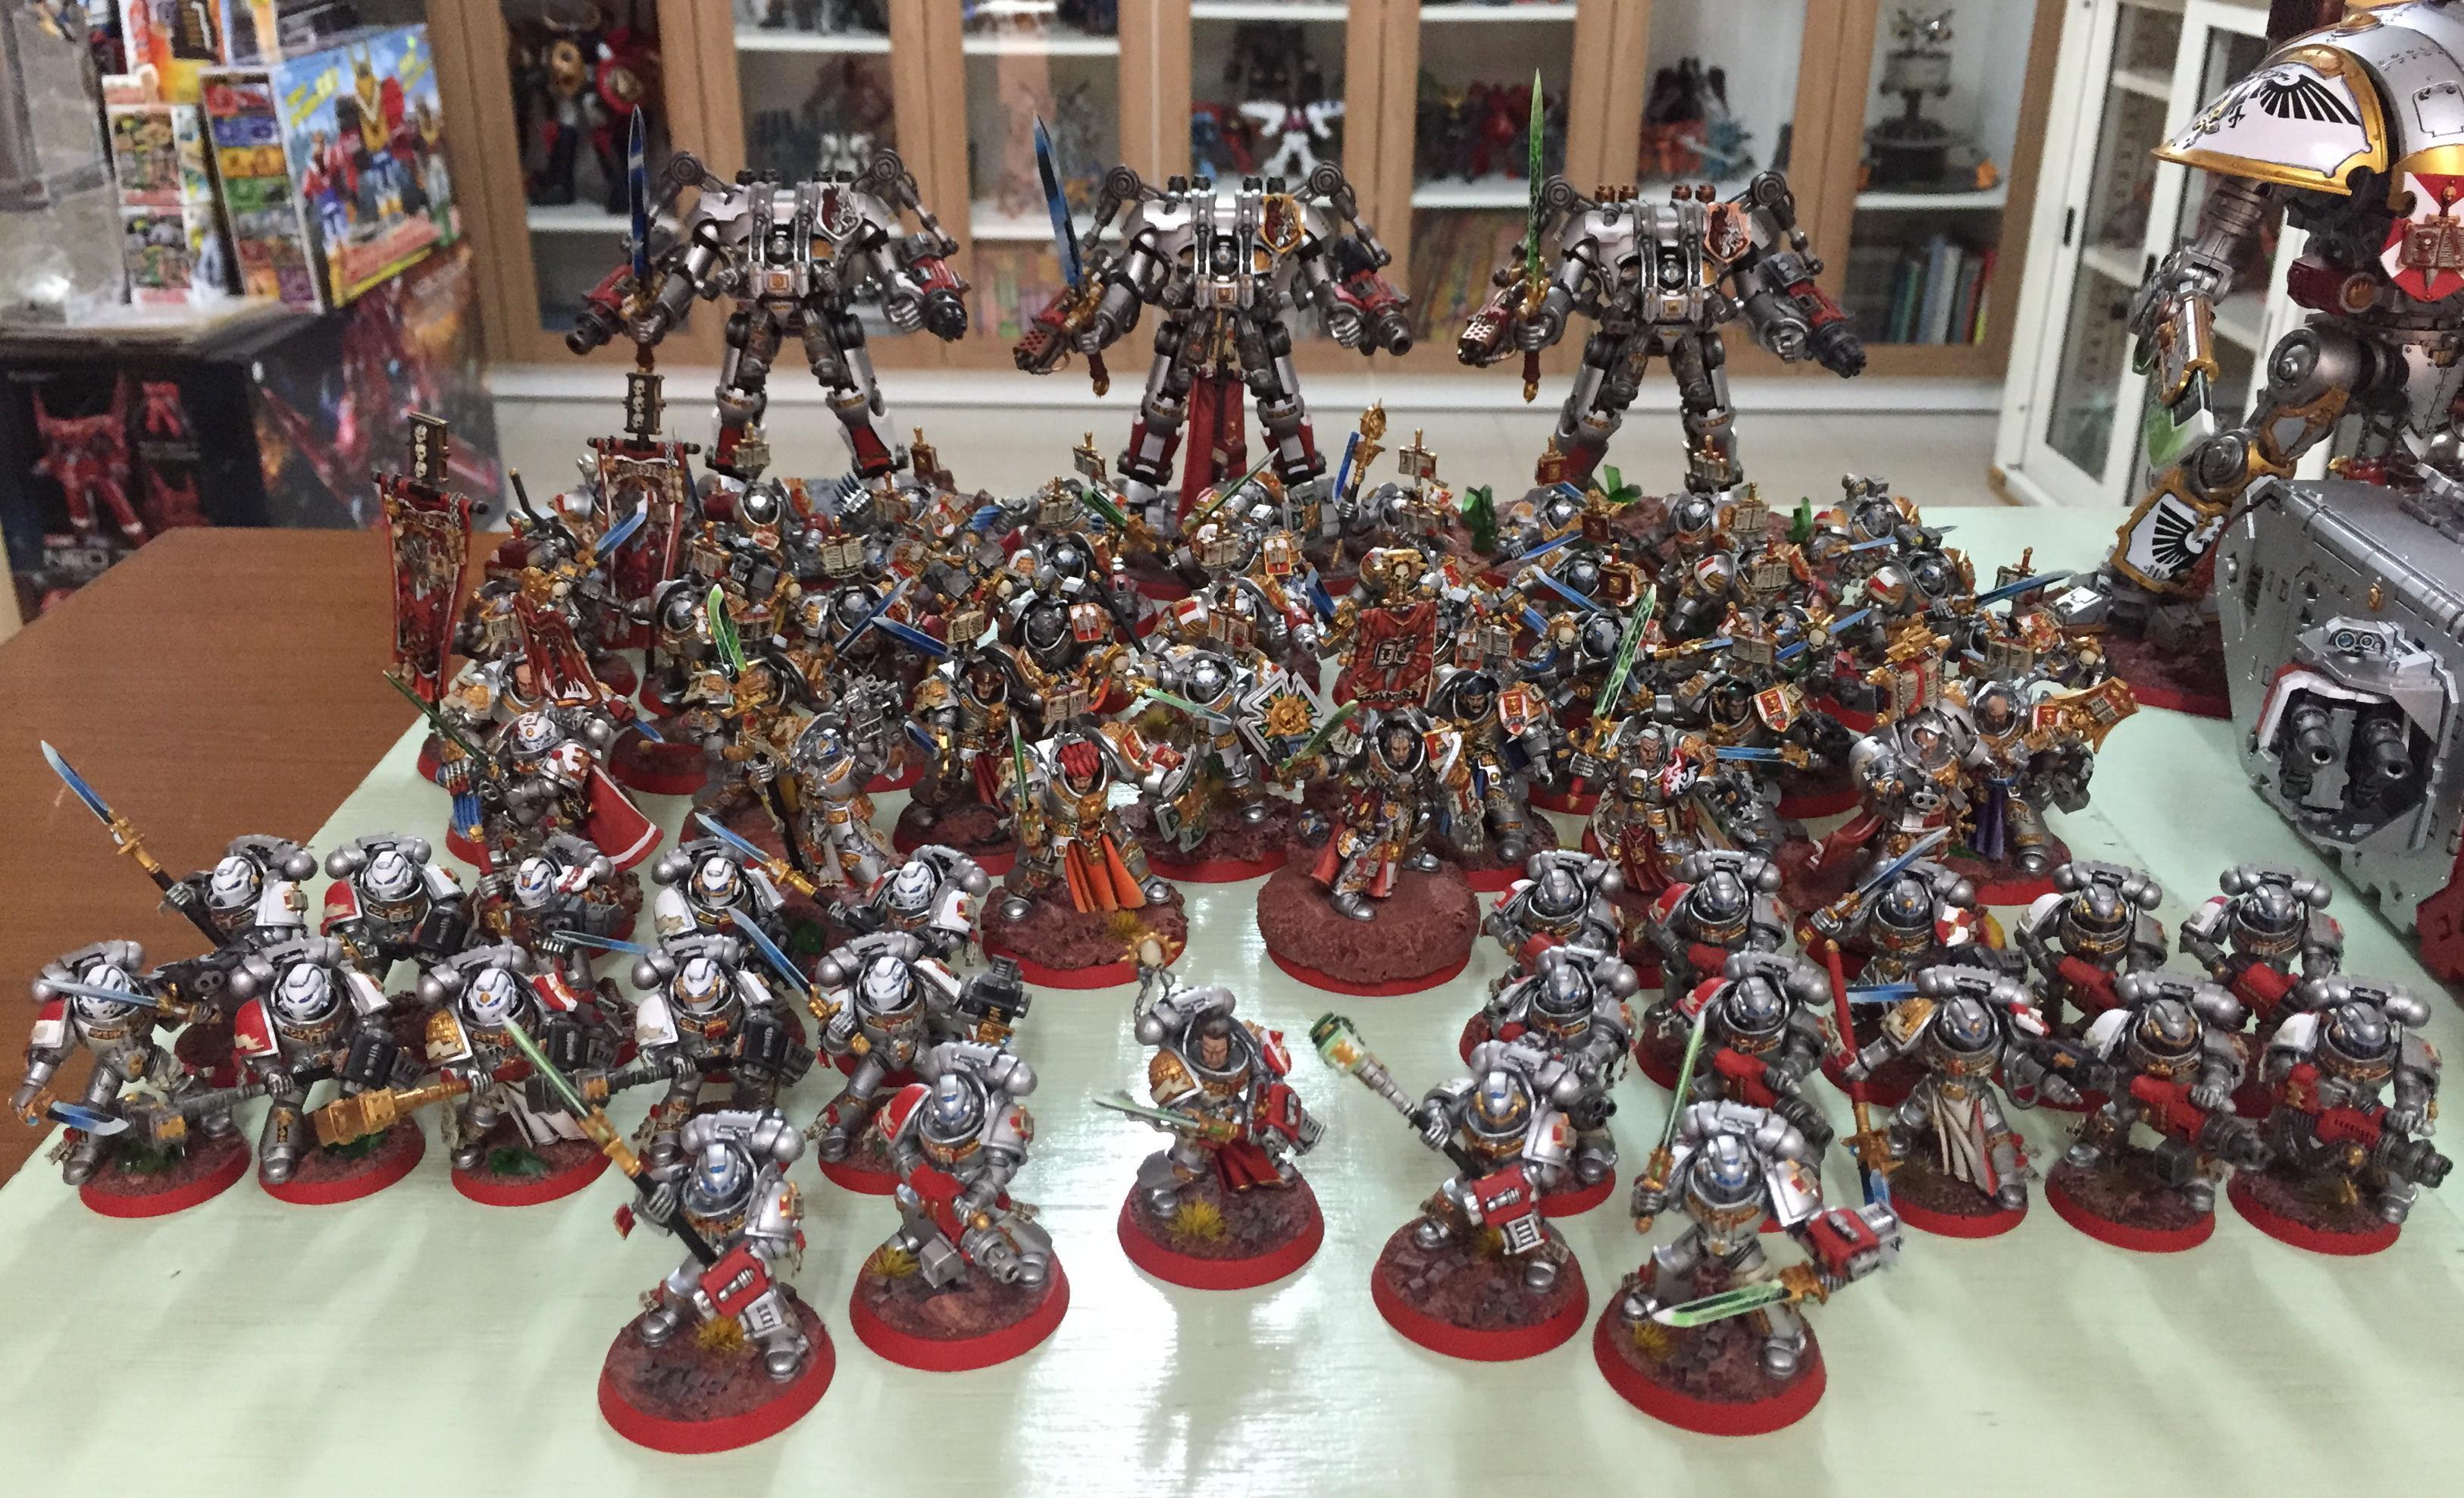 Army, Brother, Captain, Castellan, Crowe, Draigo, Dreadknight, Grey Knights, Justicar, Librarian, Lord Kaldor Draigo, Paladin, Purgation, Purifier, Stern, Strike Squad